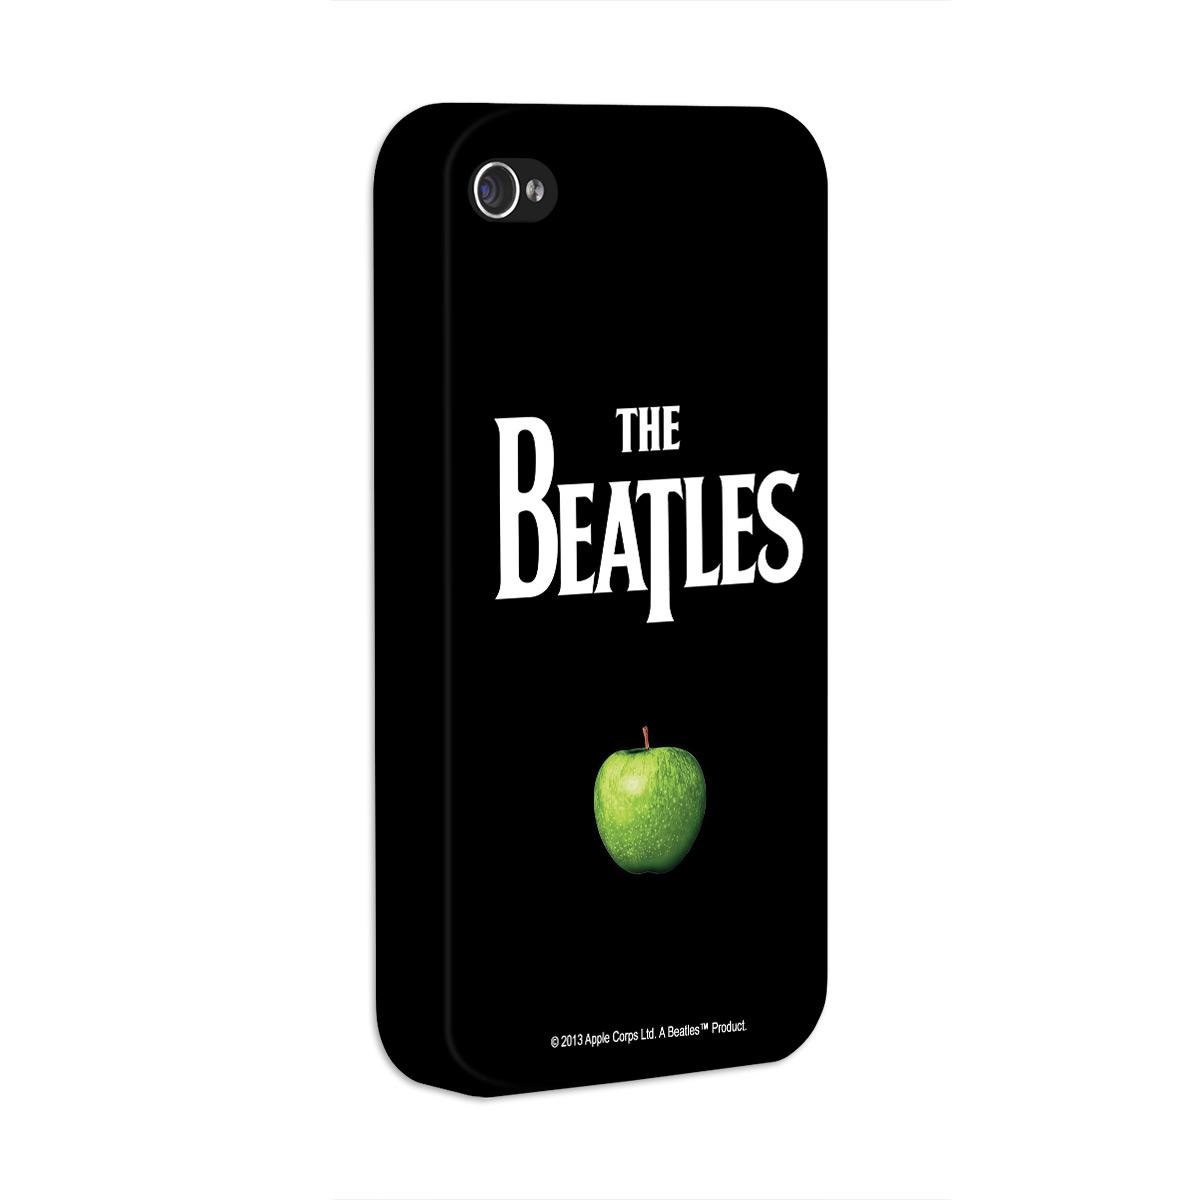 Capa de iPhone 4/4S The Beatles Apple Basic